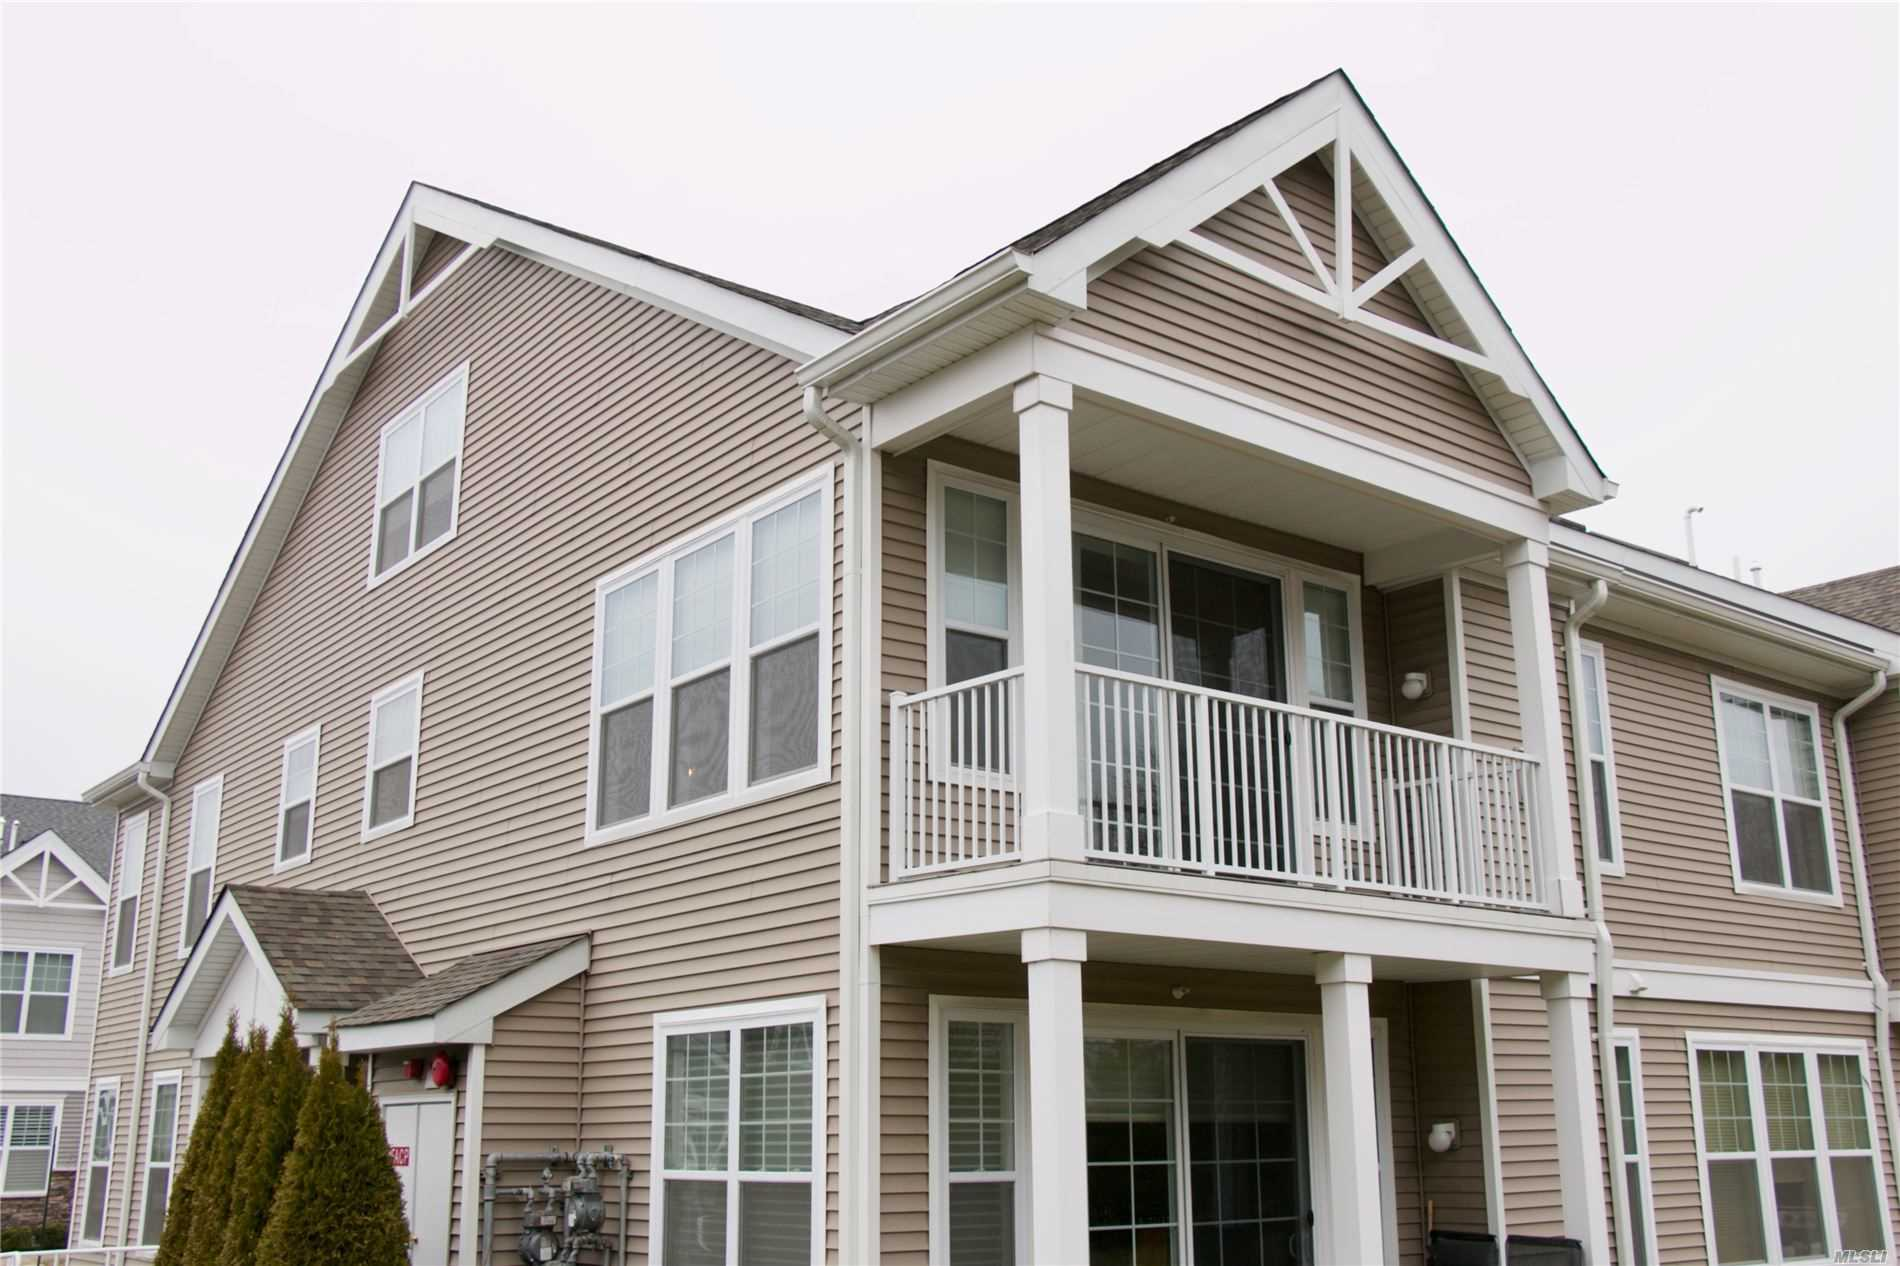 Property for sale at 2502 Townhome Way, Huntington Sta NY 11746, Huntington Sta,  New York 11746